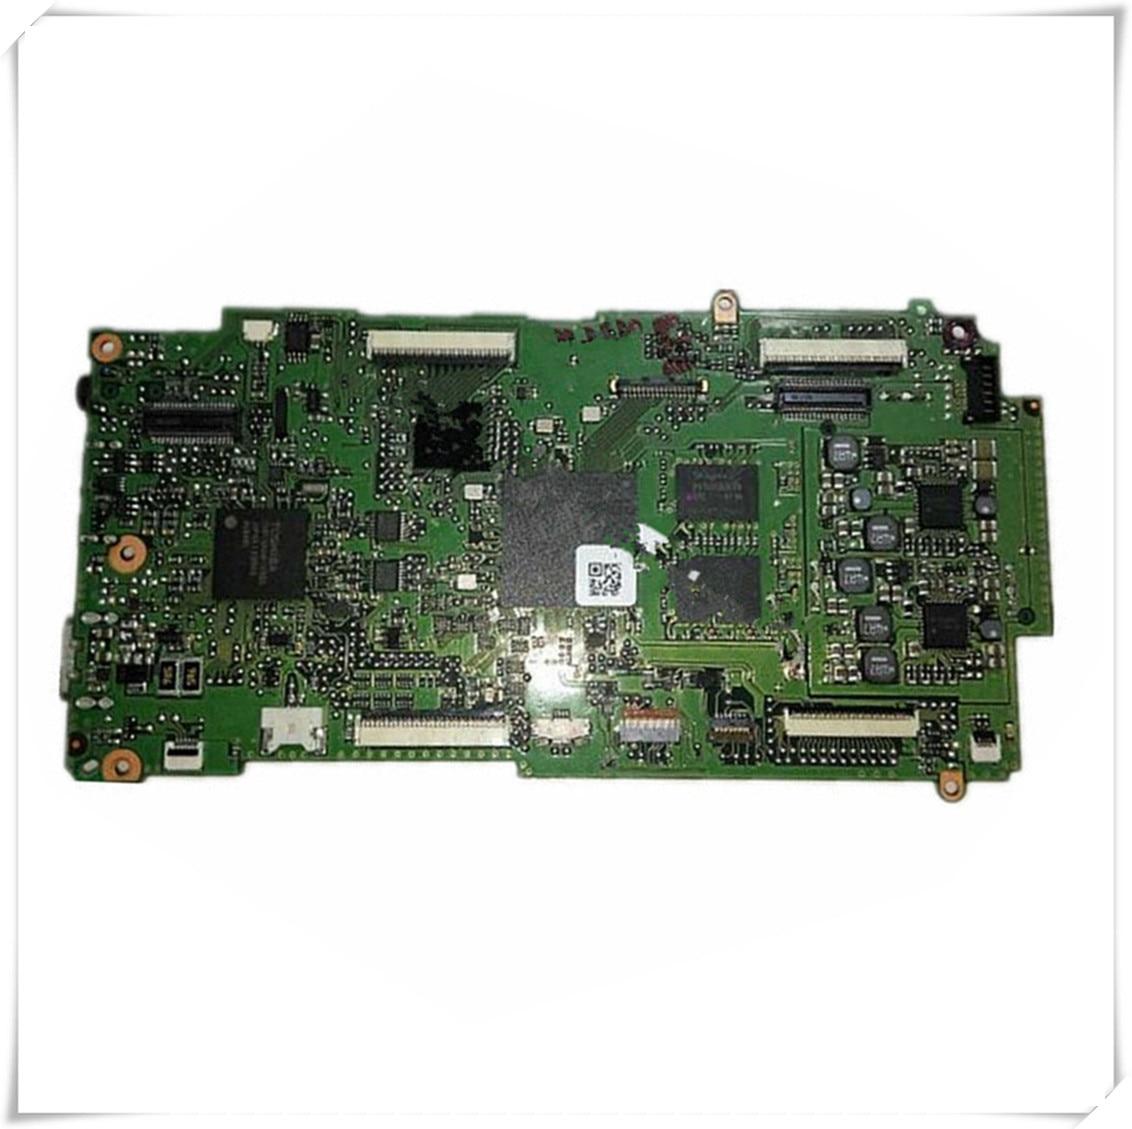 100% Original D800 Motherboard For Nikon D800 Mainboard D800 Main Board Camera Repair